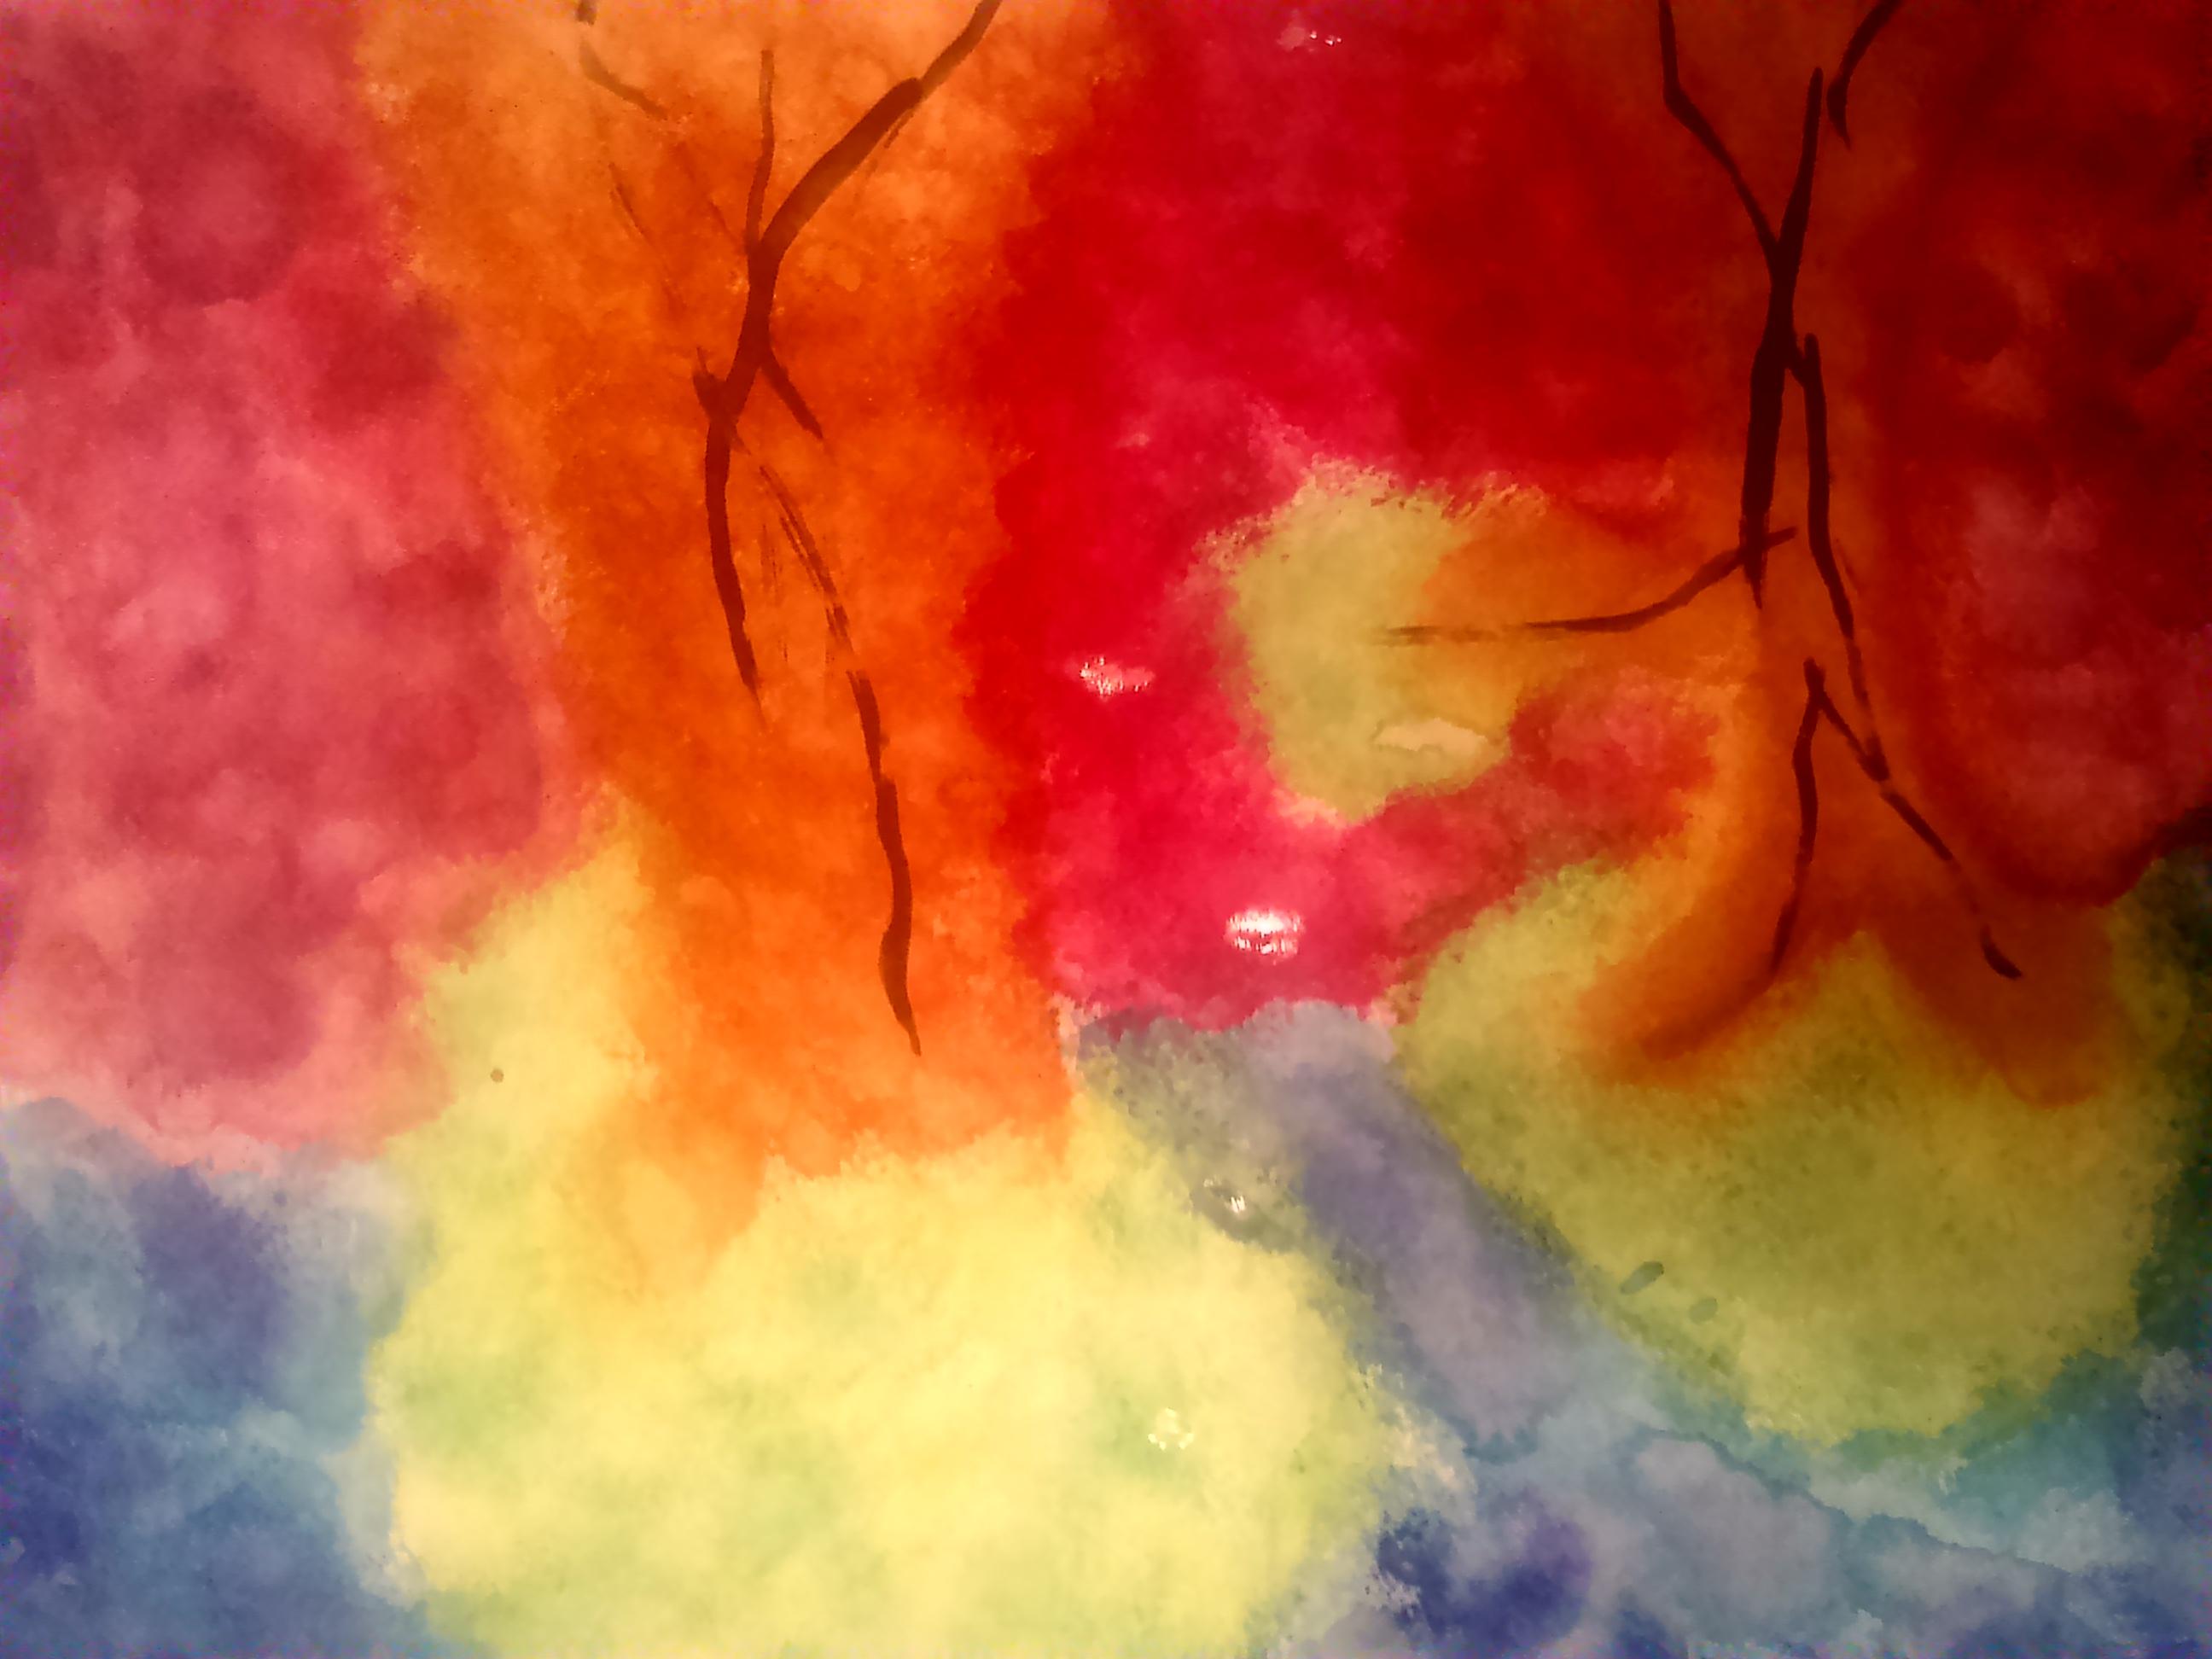 Abstrakte kunst - Natur